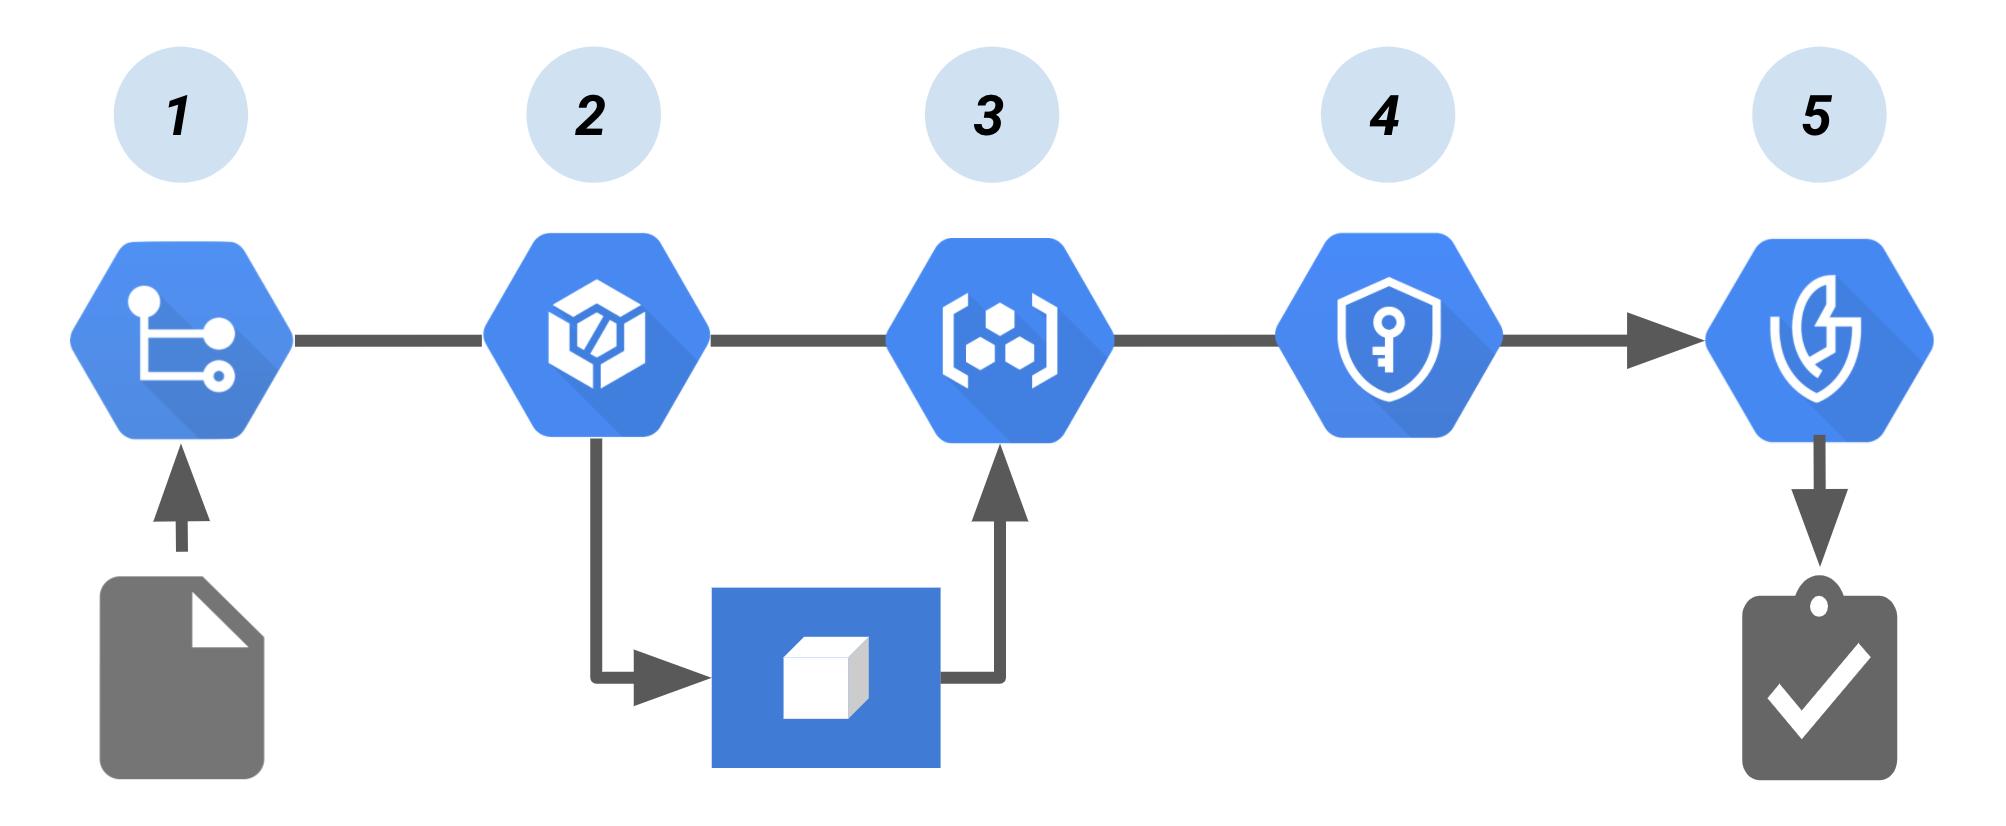 Cloud Build/Binary Authorization 证明流水线。